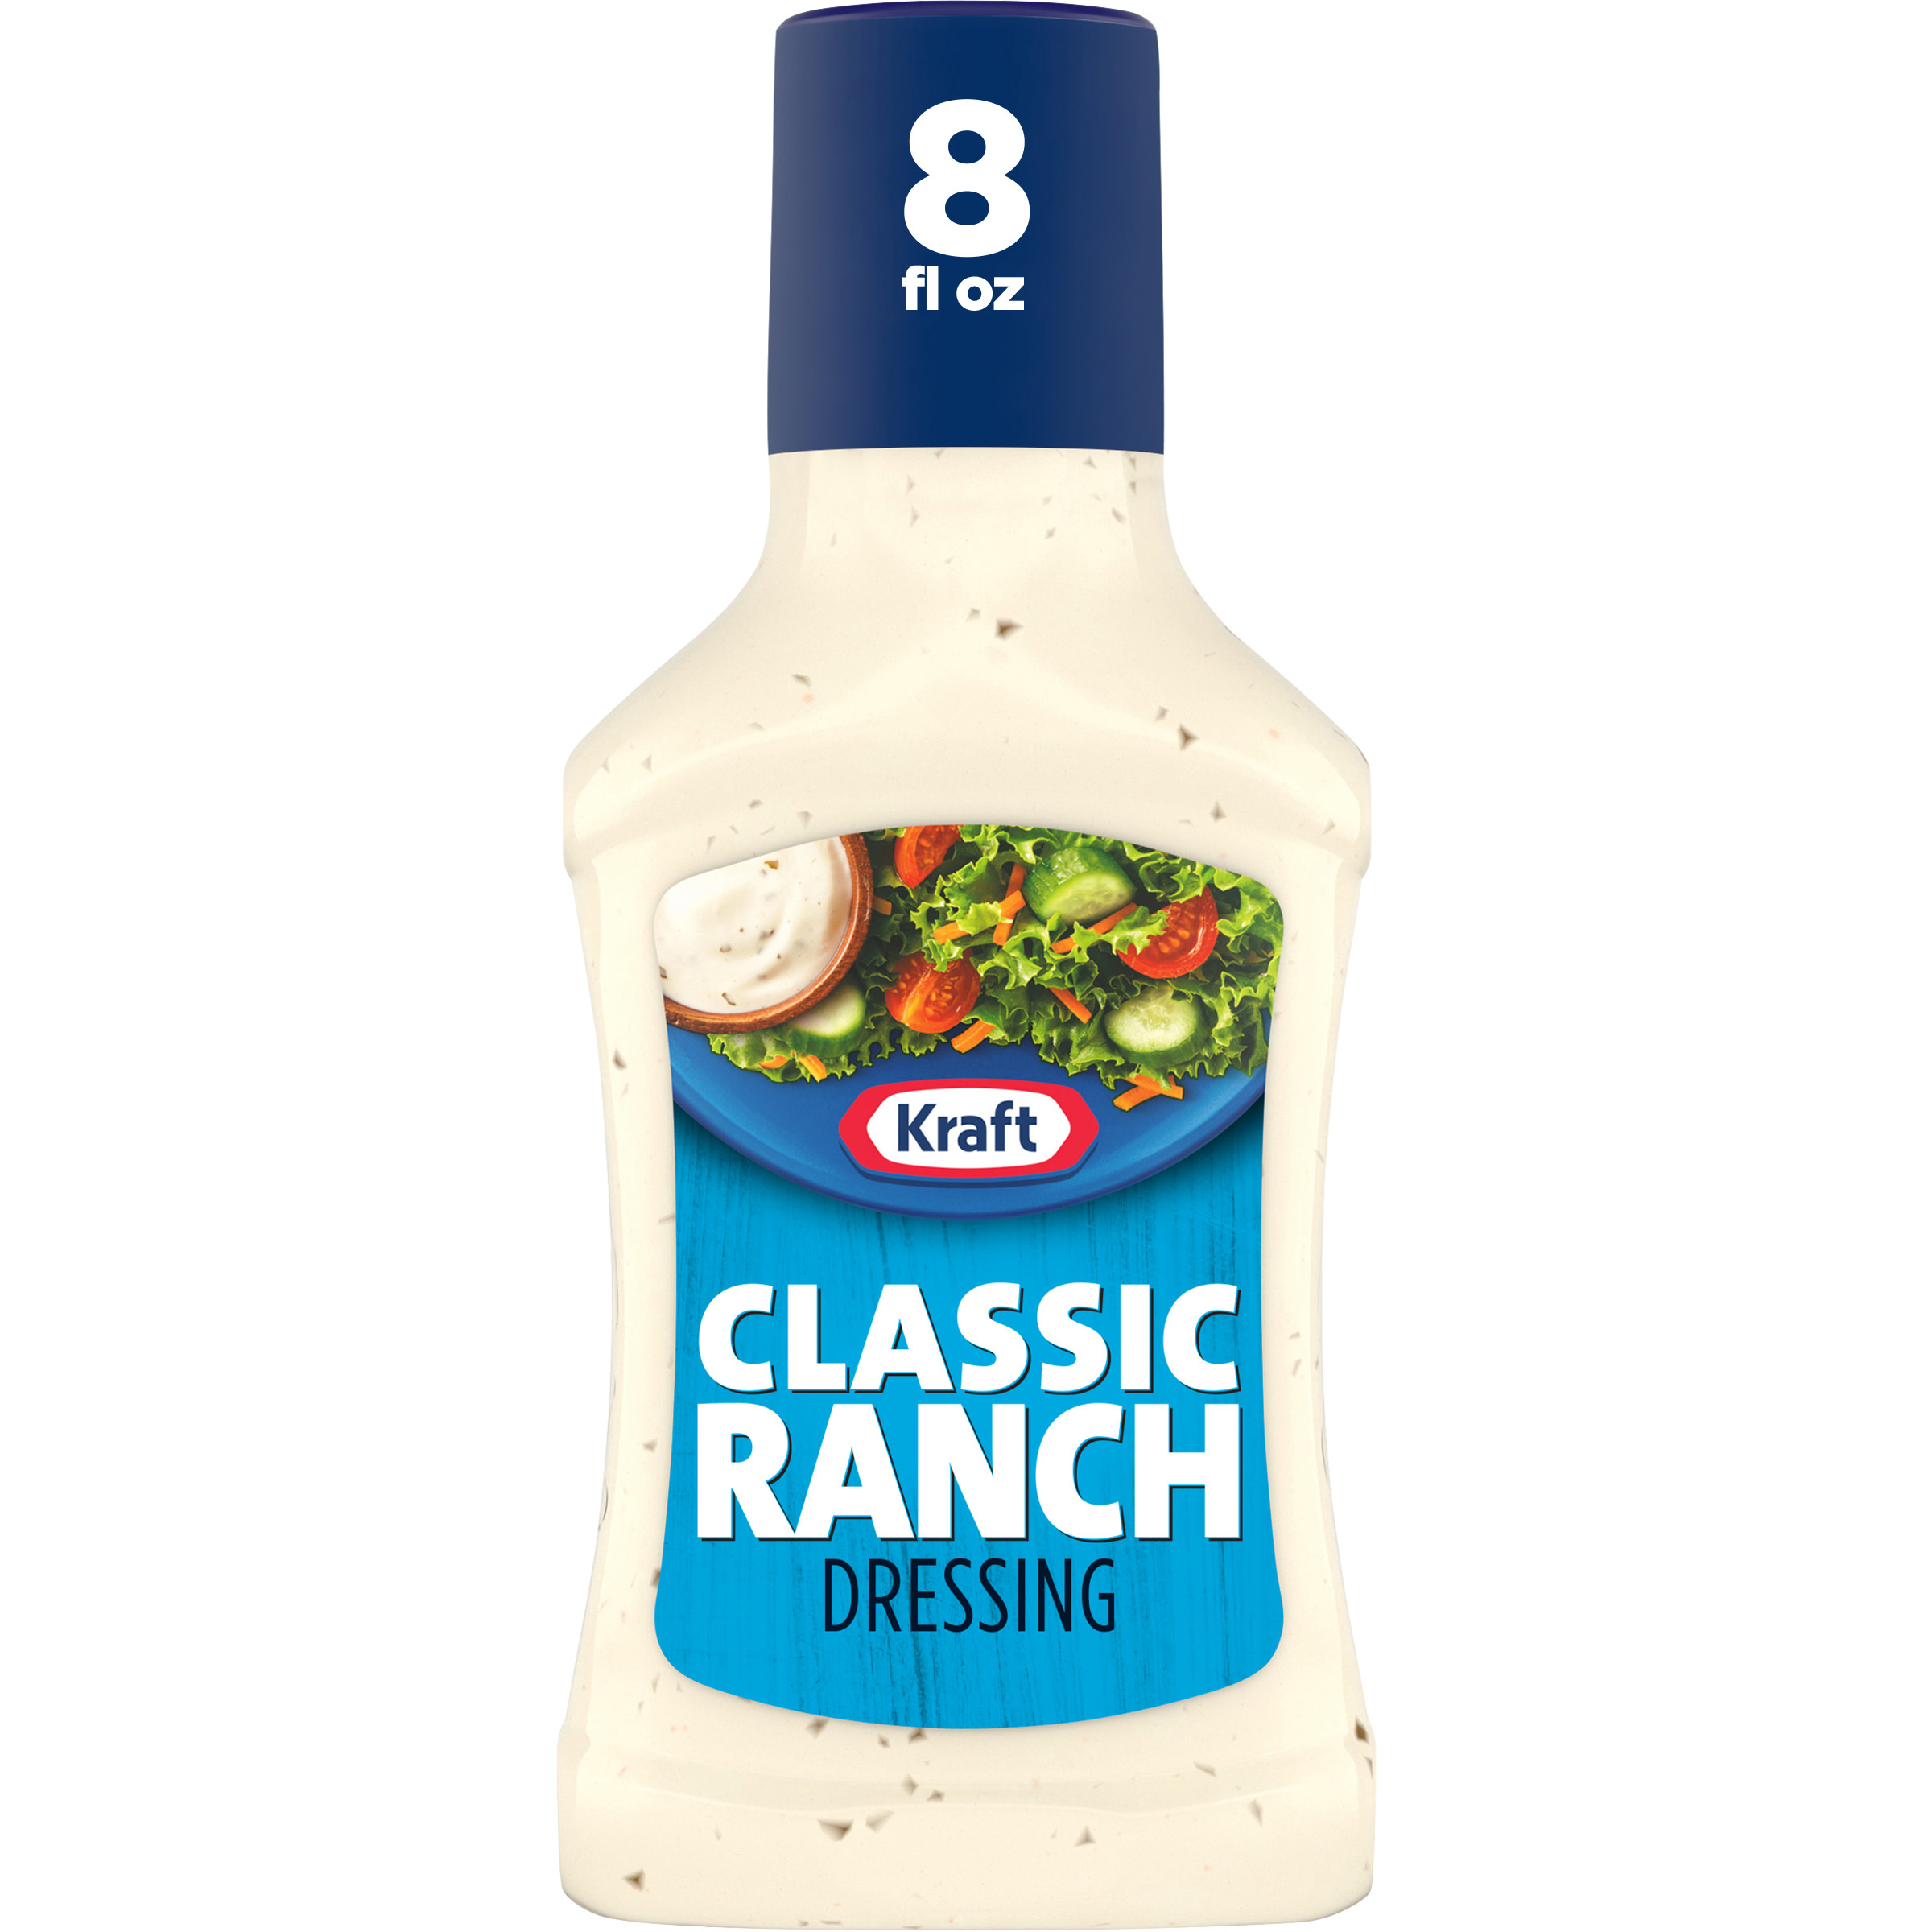 Kraft Classic Ranch Salad Dressing, 8 fl oz Bottle